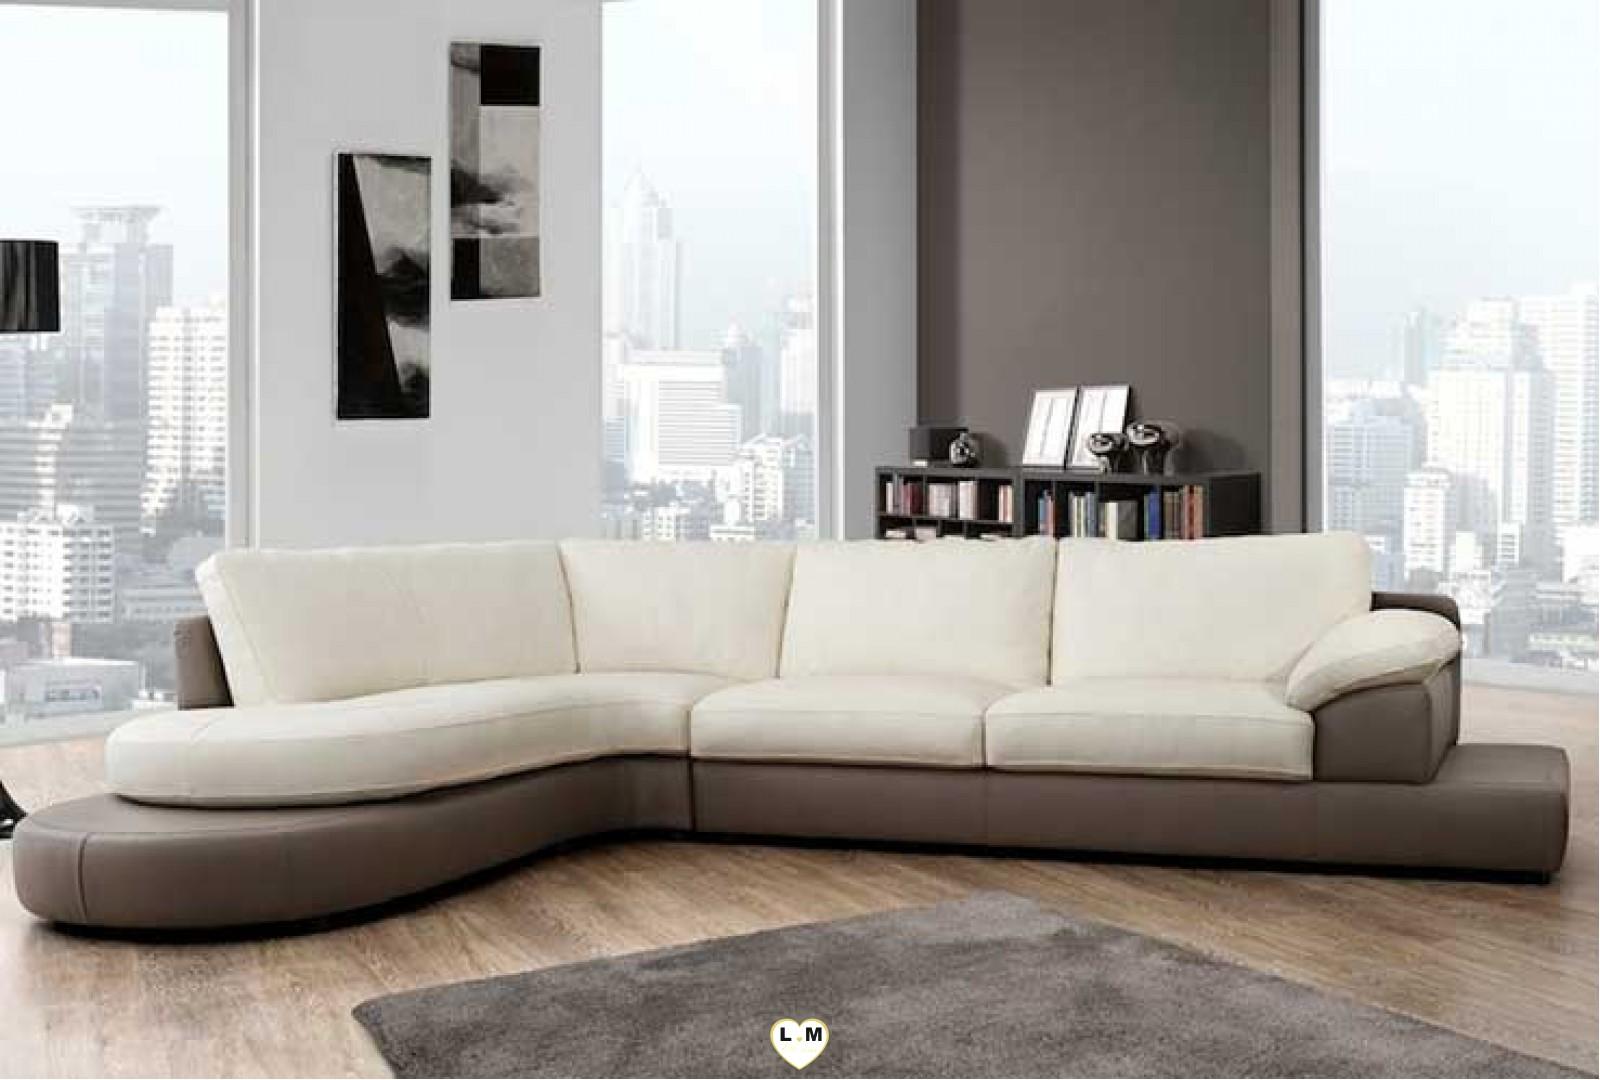 capucine angle ensemble salon cuir lignemeuble com. Black Bedroom Furniture Sets. Home Design Ideas